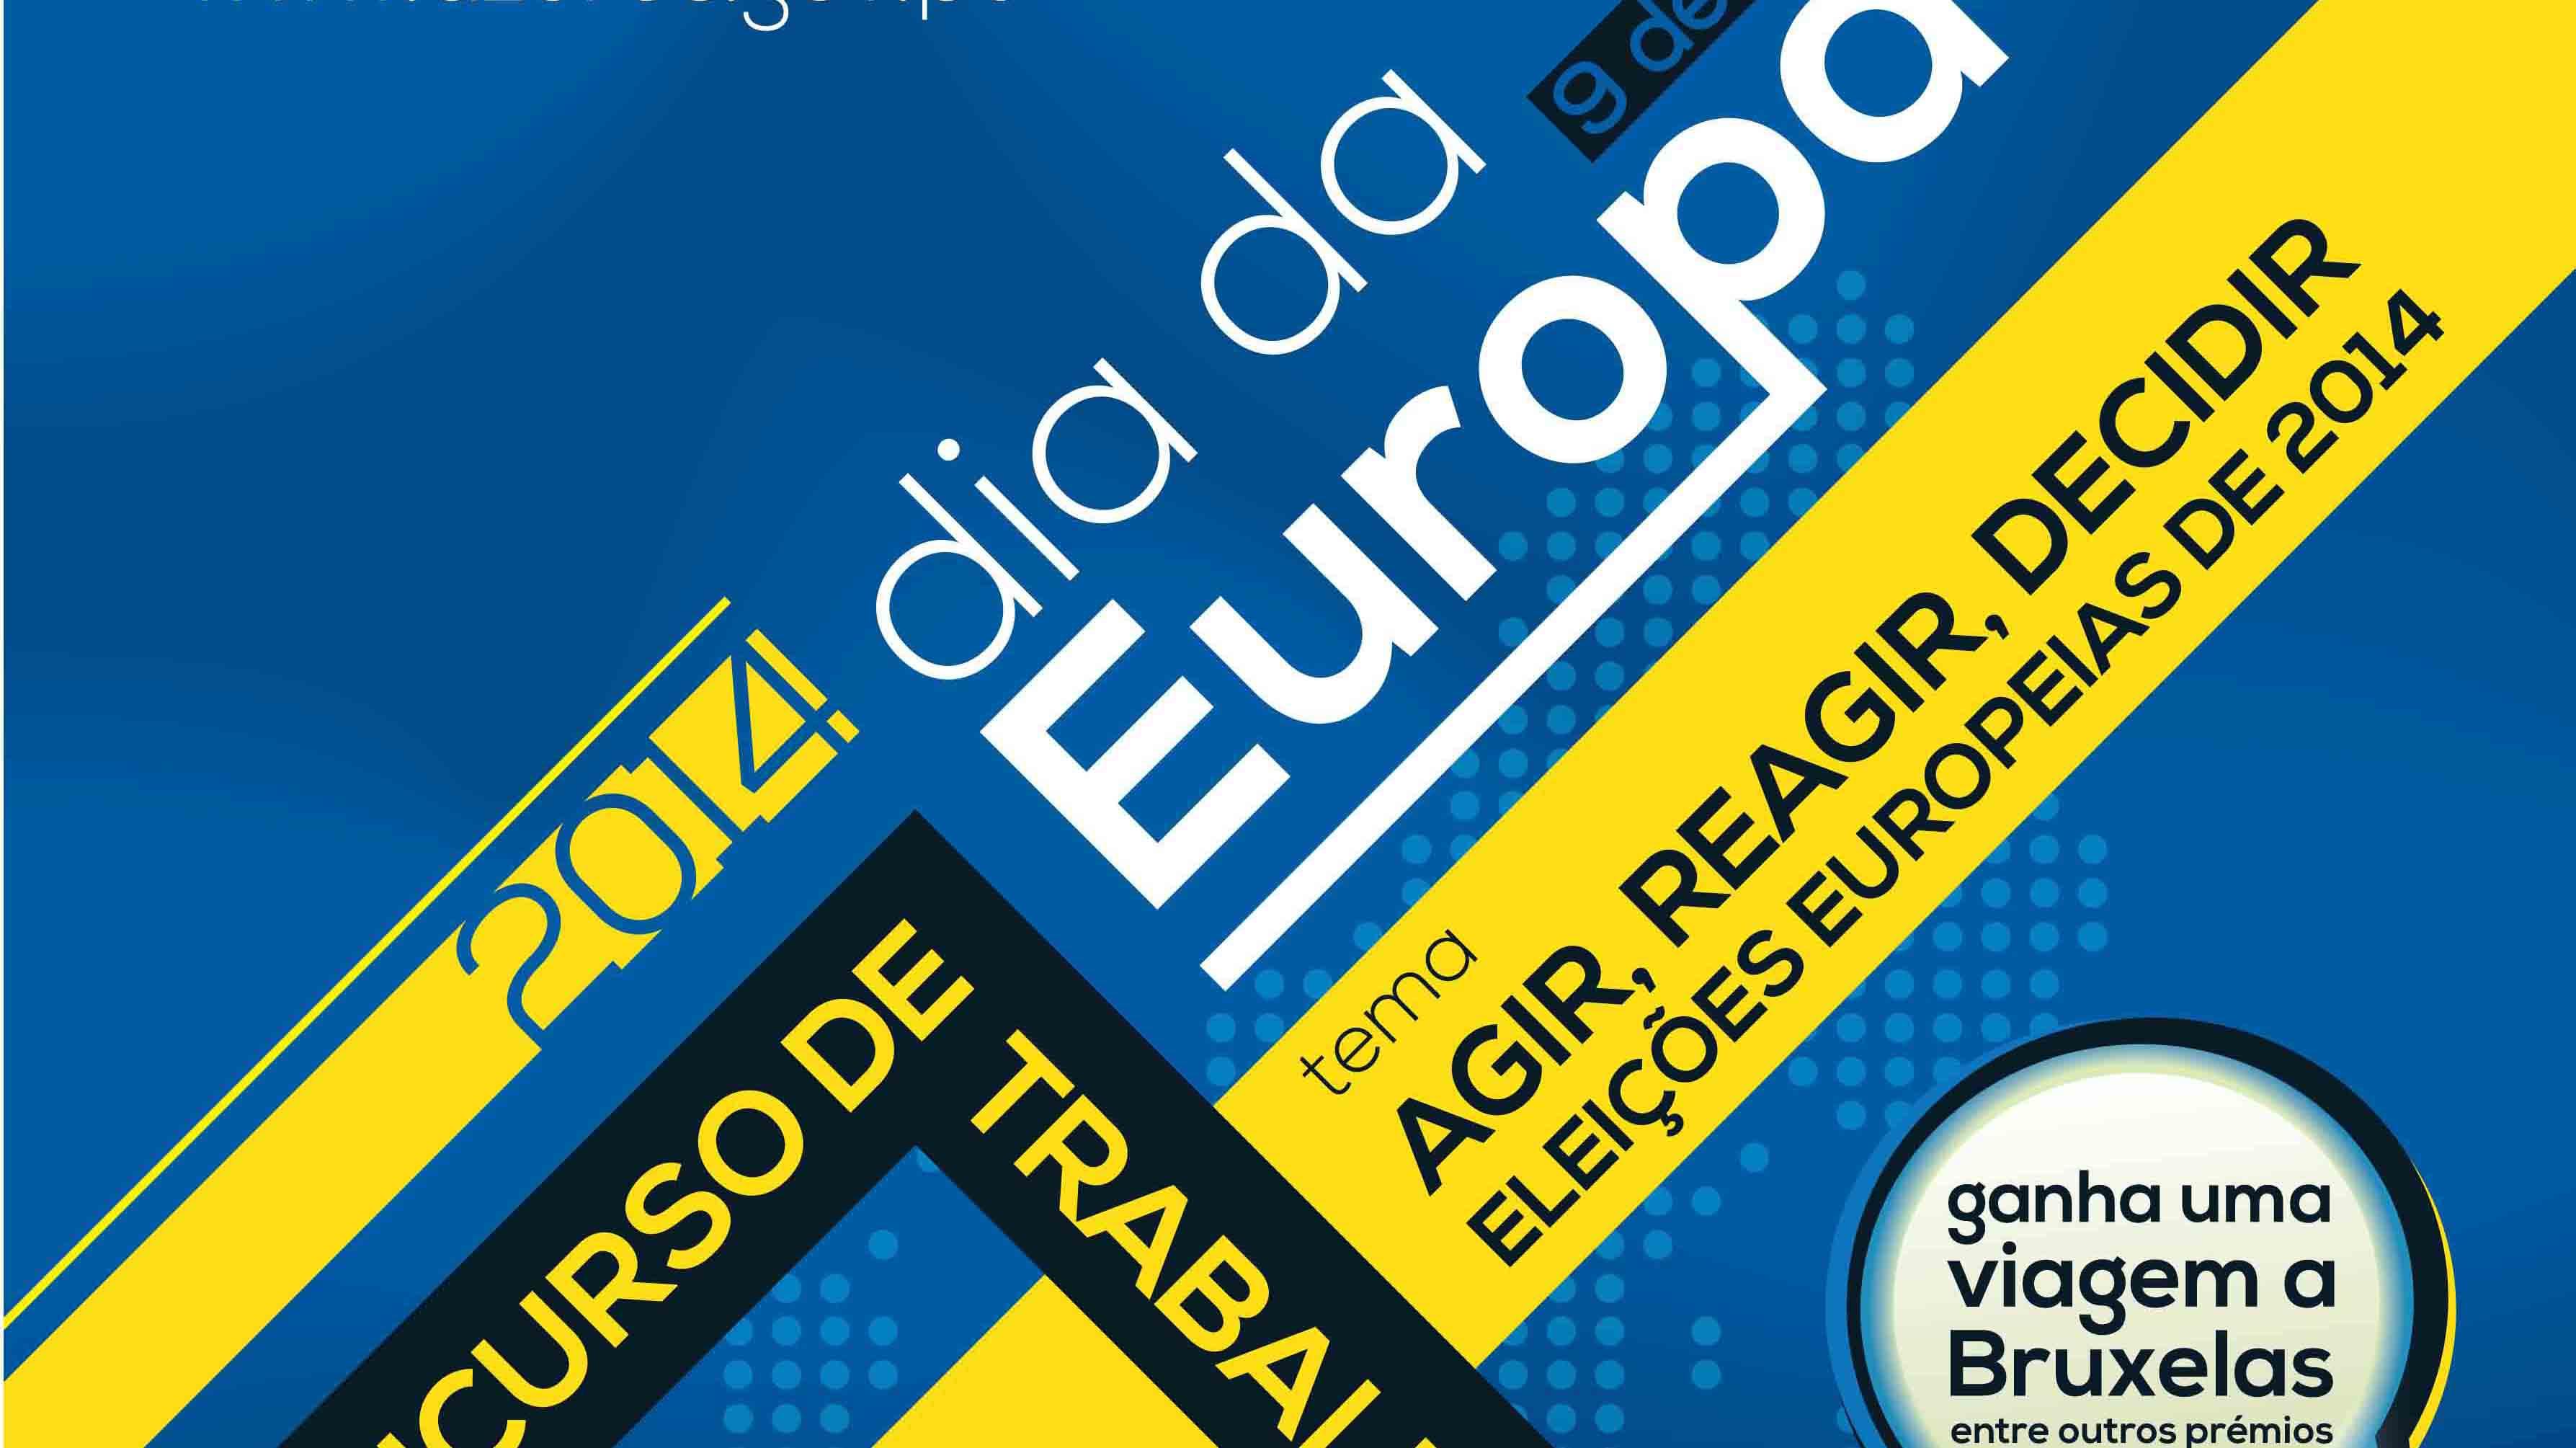 Governo dos Açores promove concurso sobre o Dia da Europa